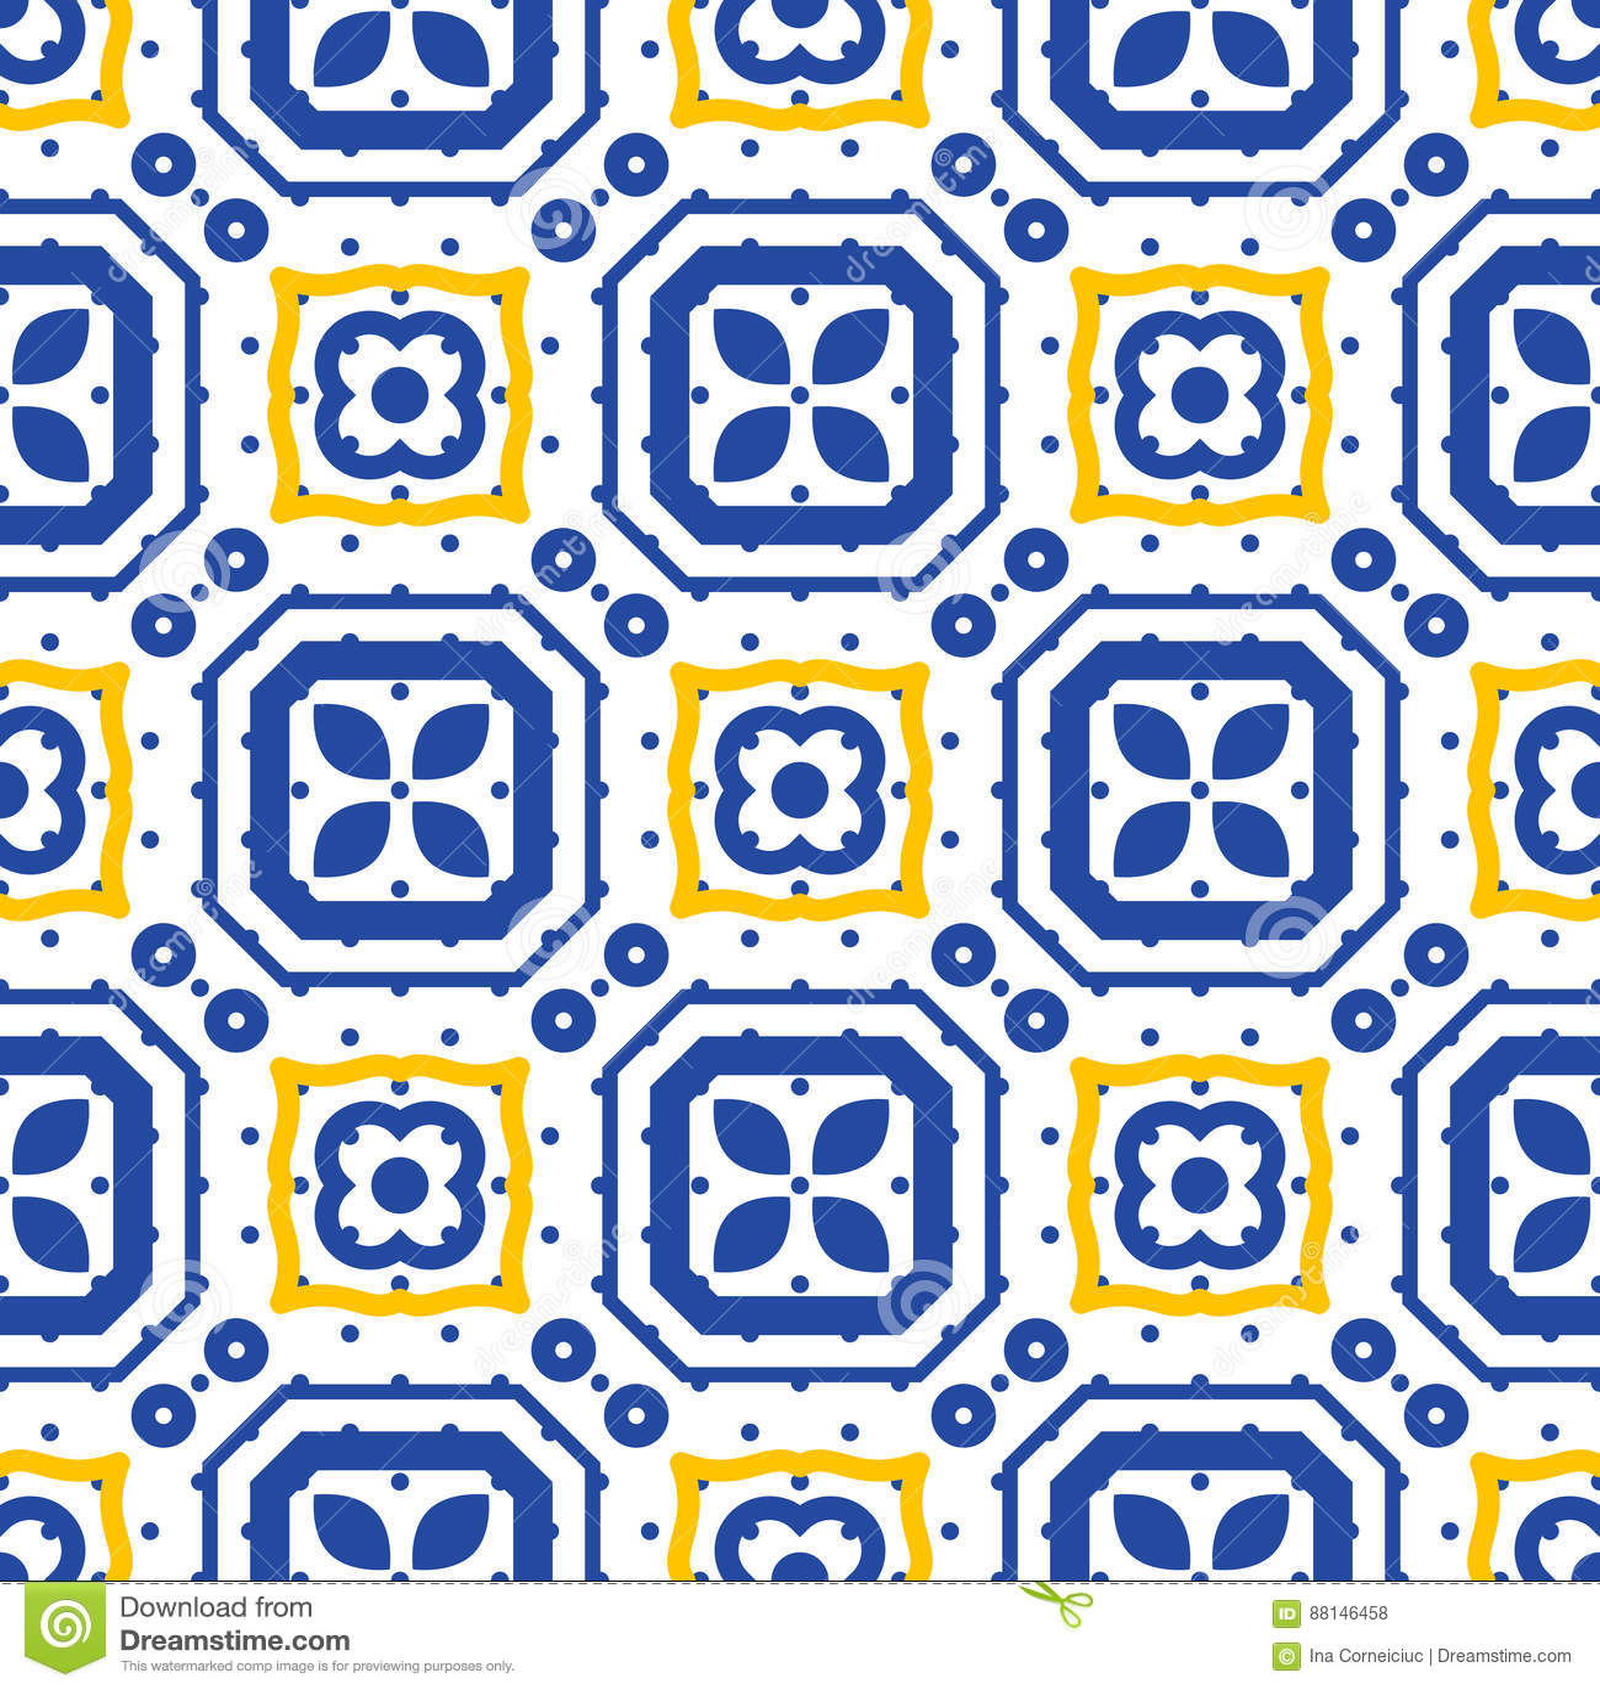 Blue and white mediterranean seamless ceramic tile pattern.